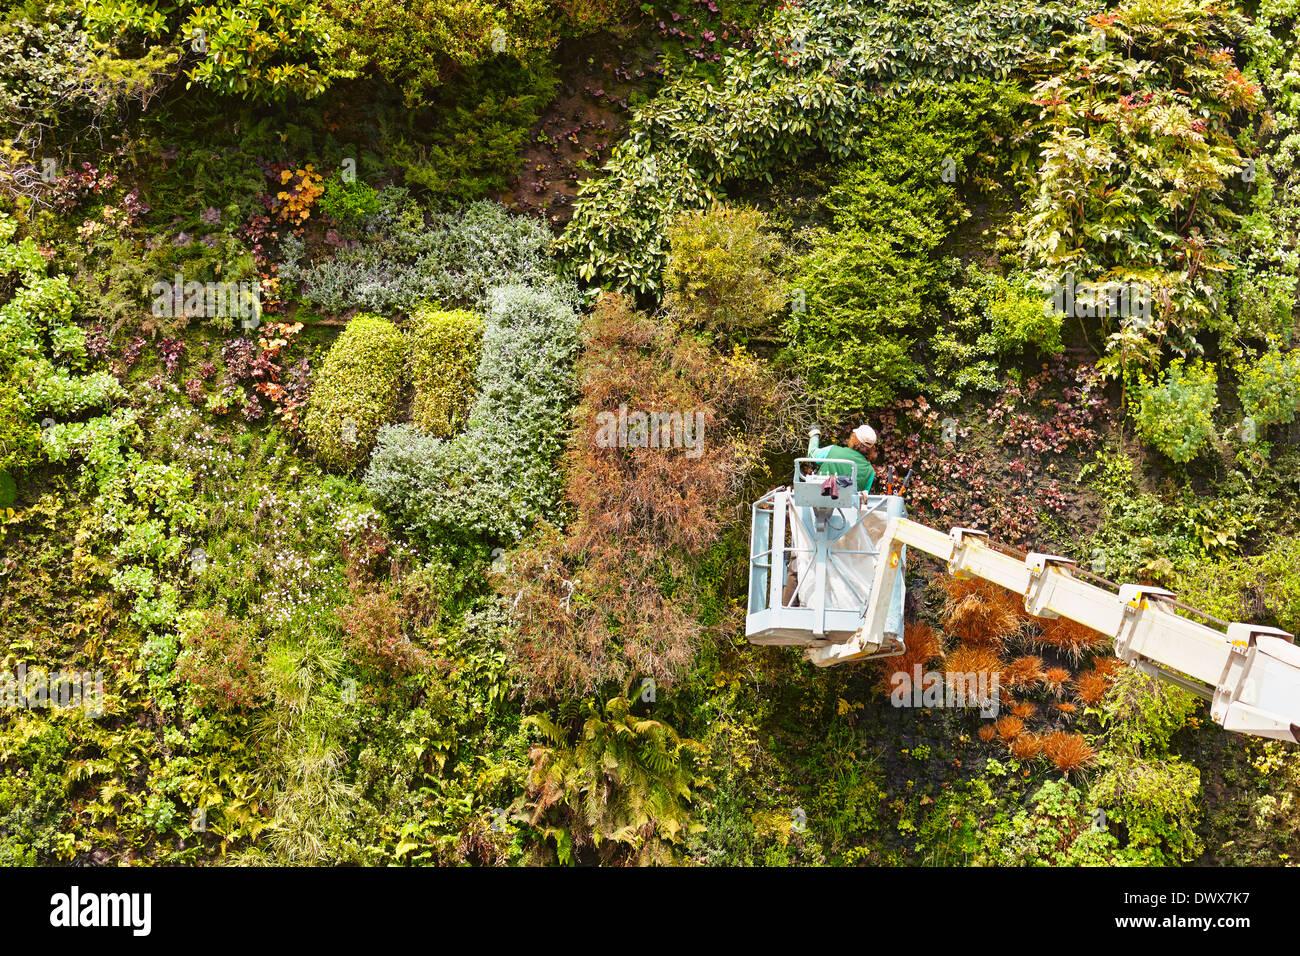 Caixaforum madrid stock photos caixaforum madrid stock images alamy - Garden center madrid ...